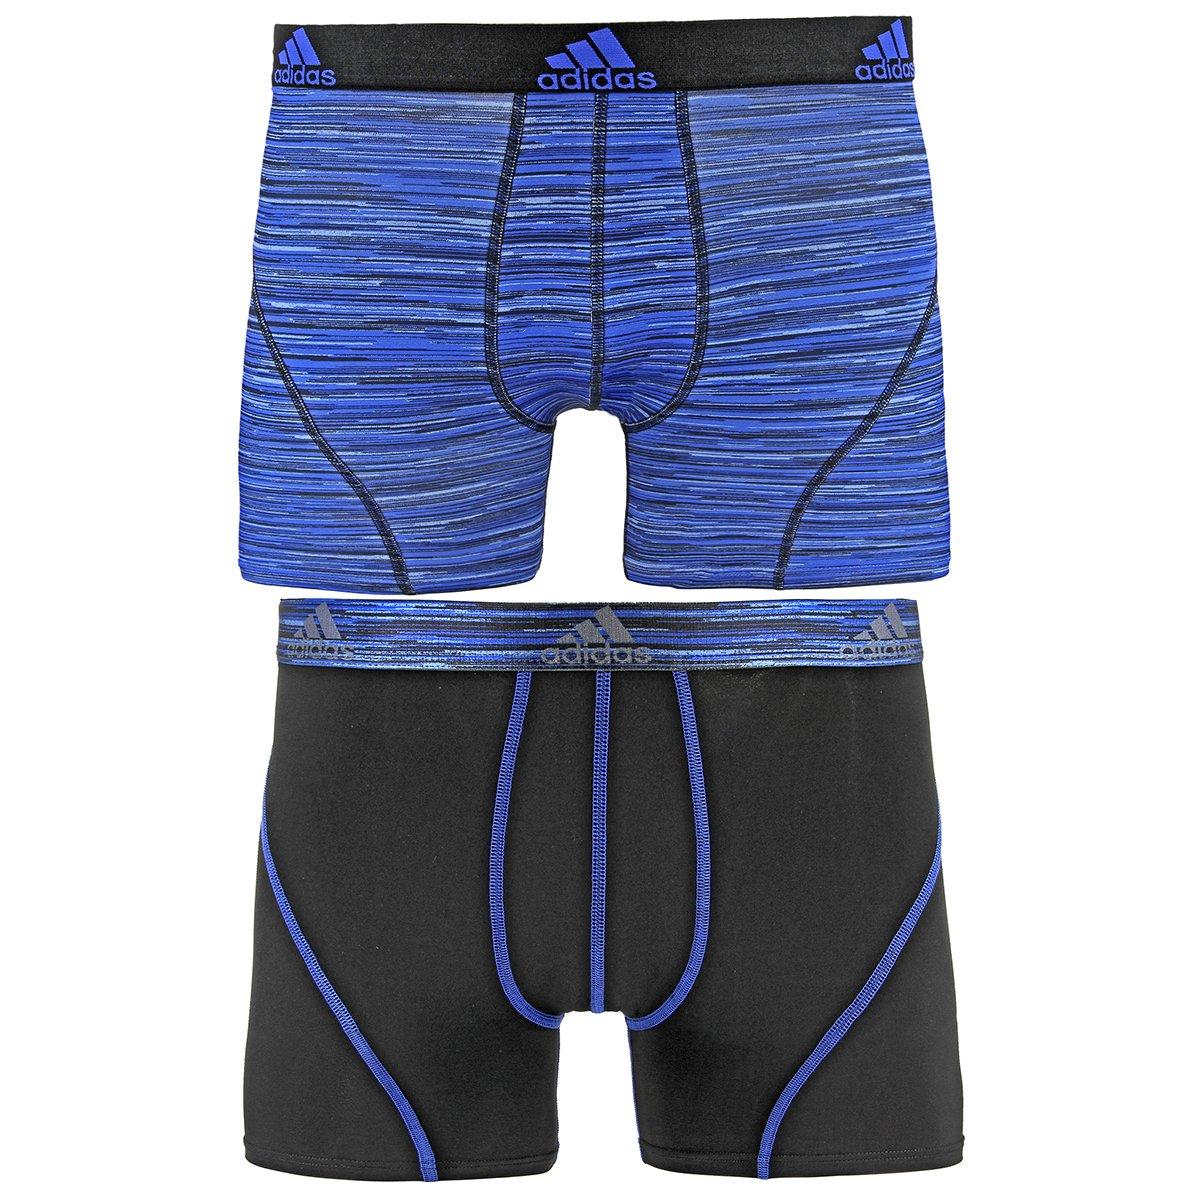 adidas Men's Sport Performance Climalite Trunk Underwear (2 Pack), Blue Looper Print/Black, Medium by adidas